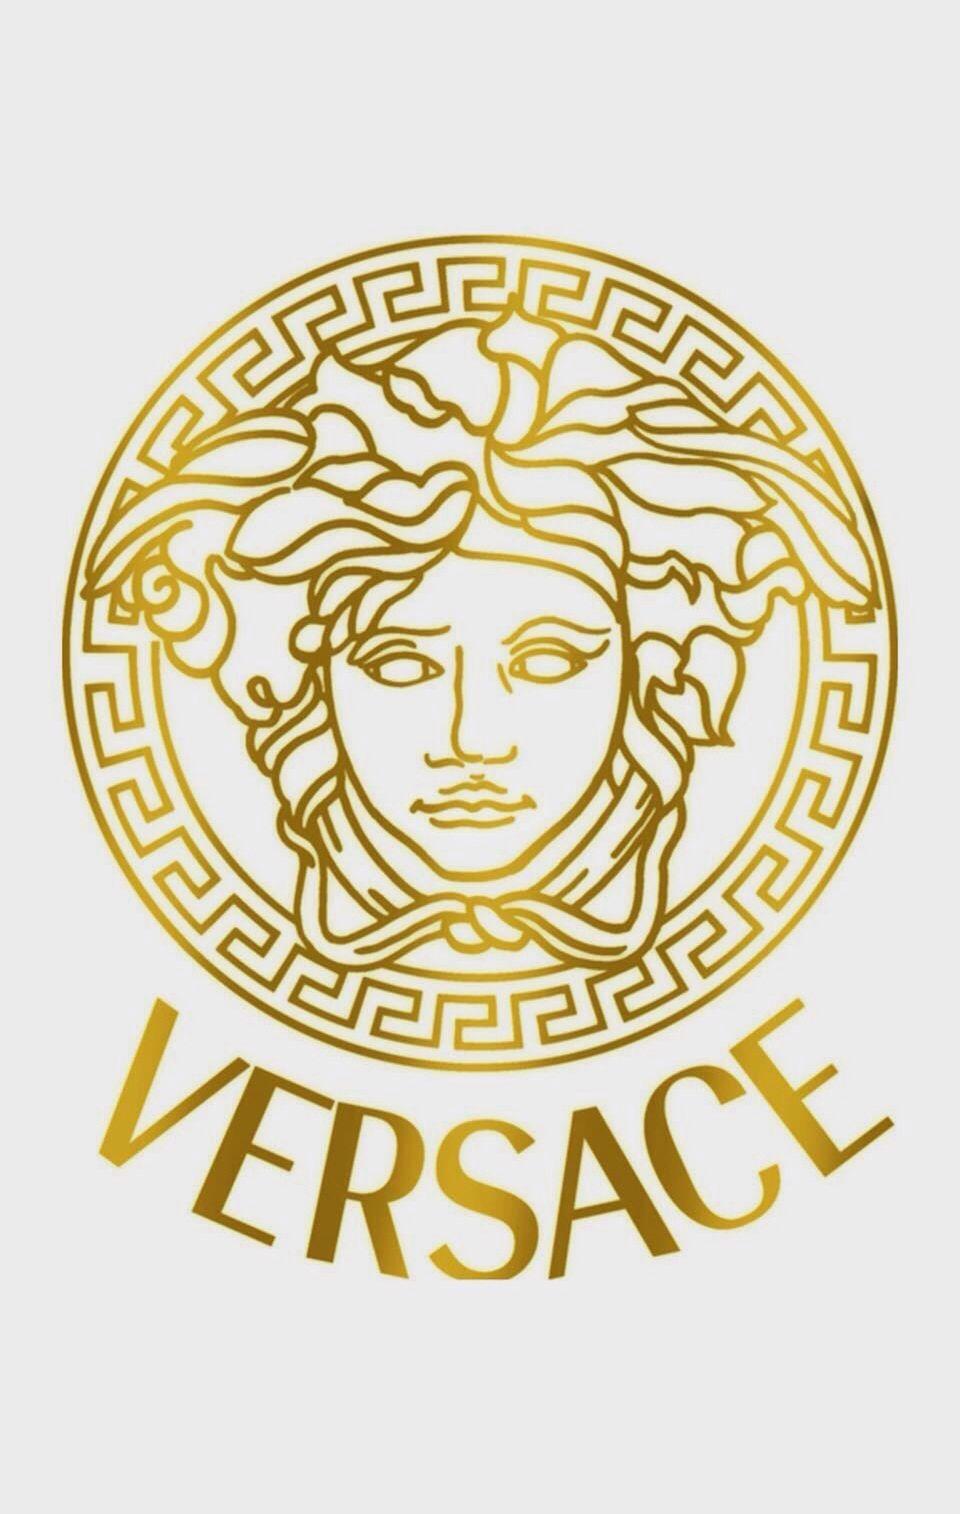 b9133b5809 Versage | art | Logos de moda, Logo versace, Versace